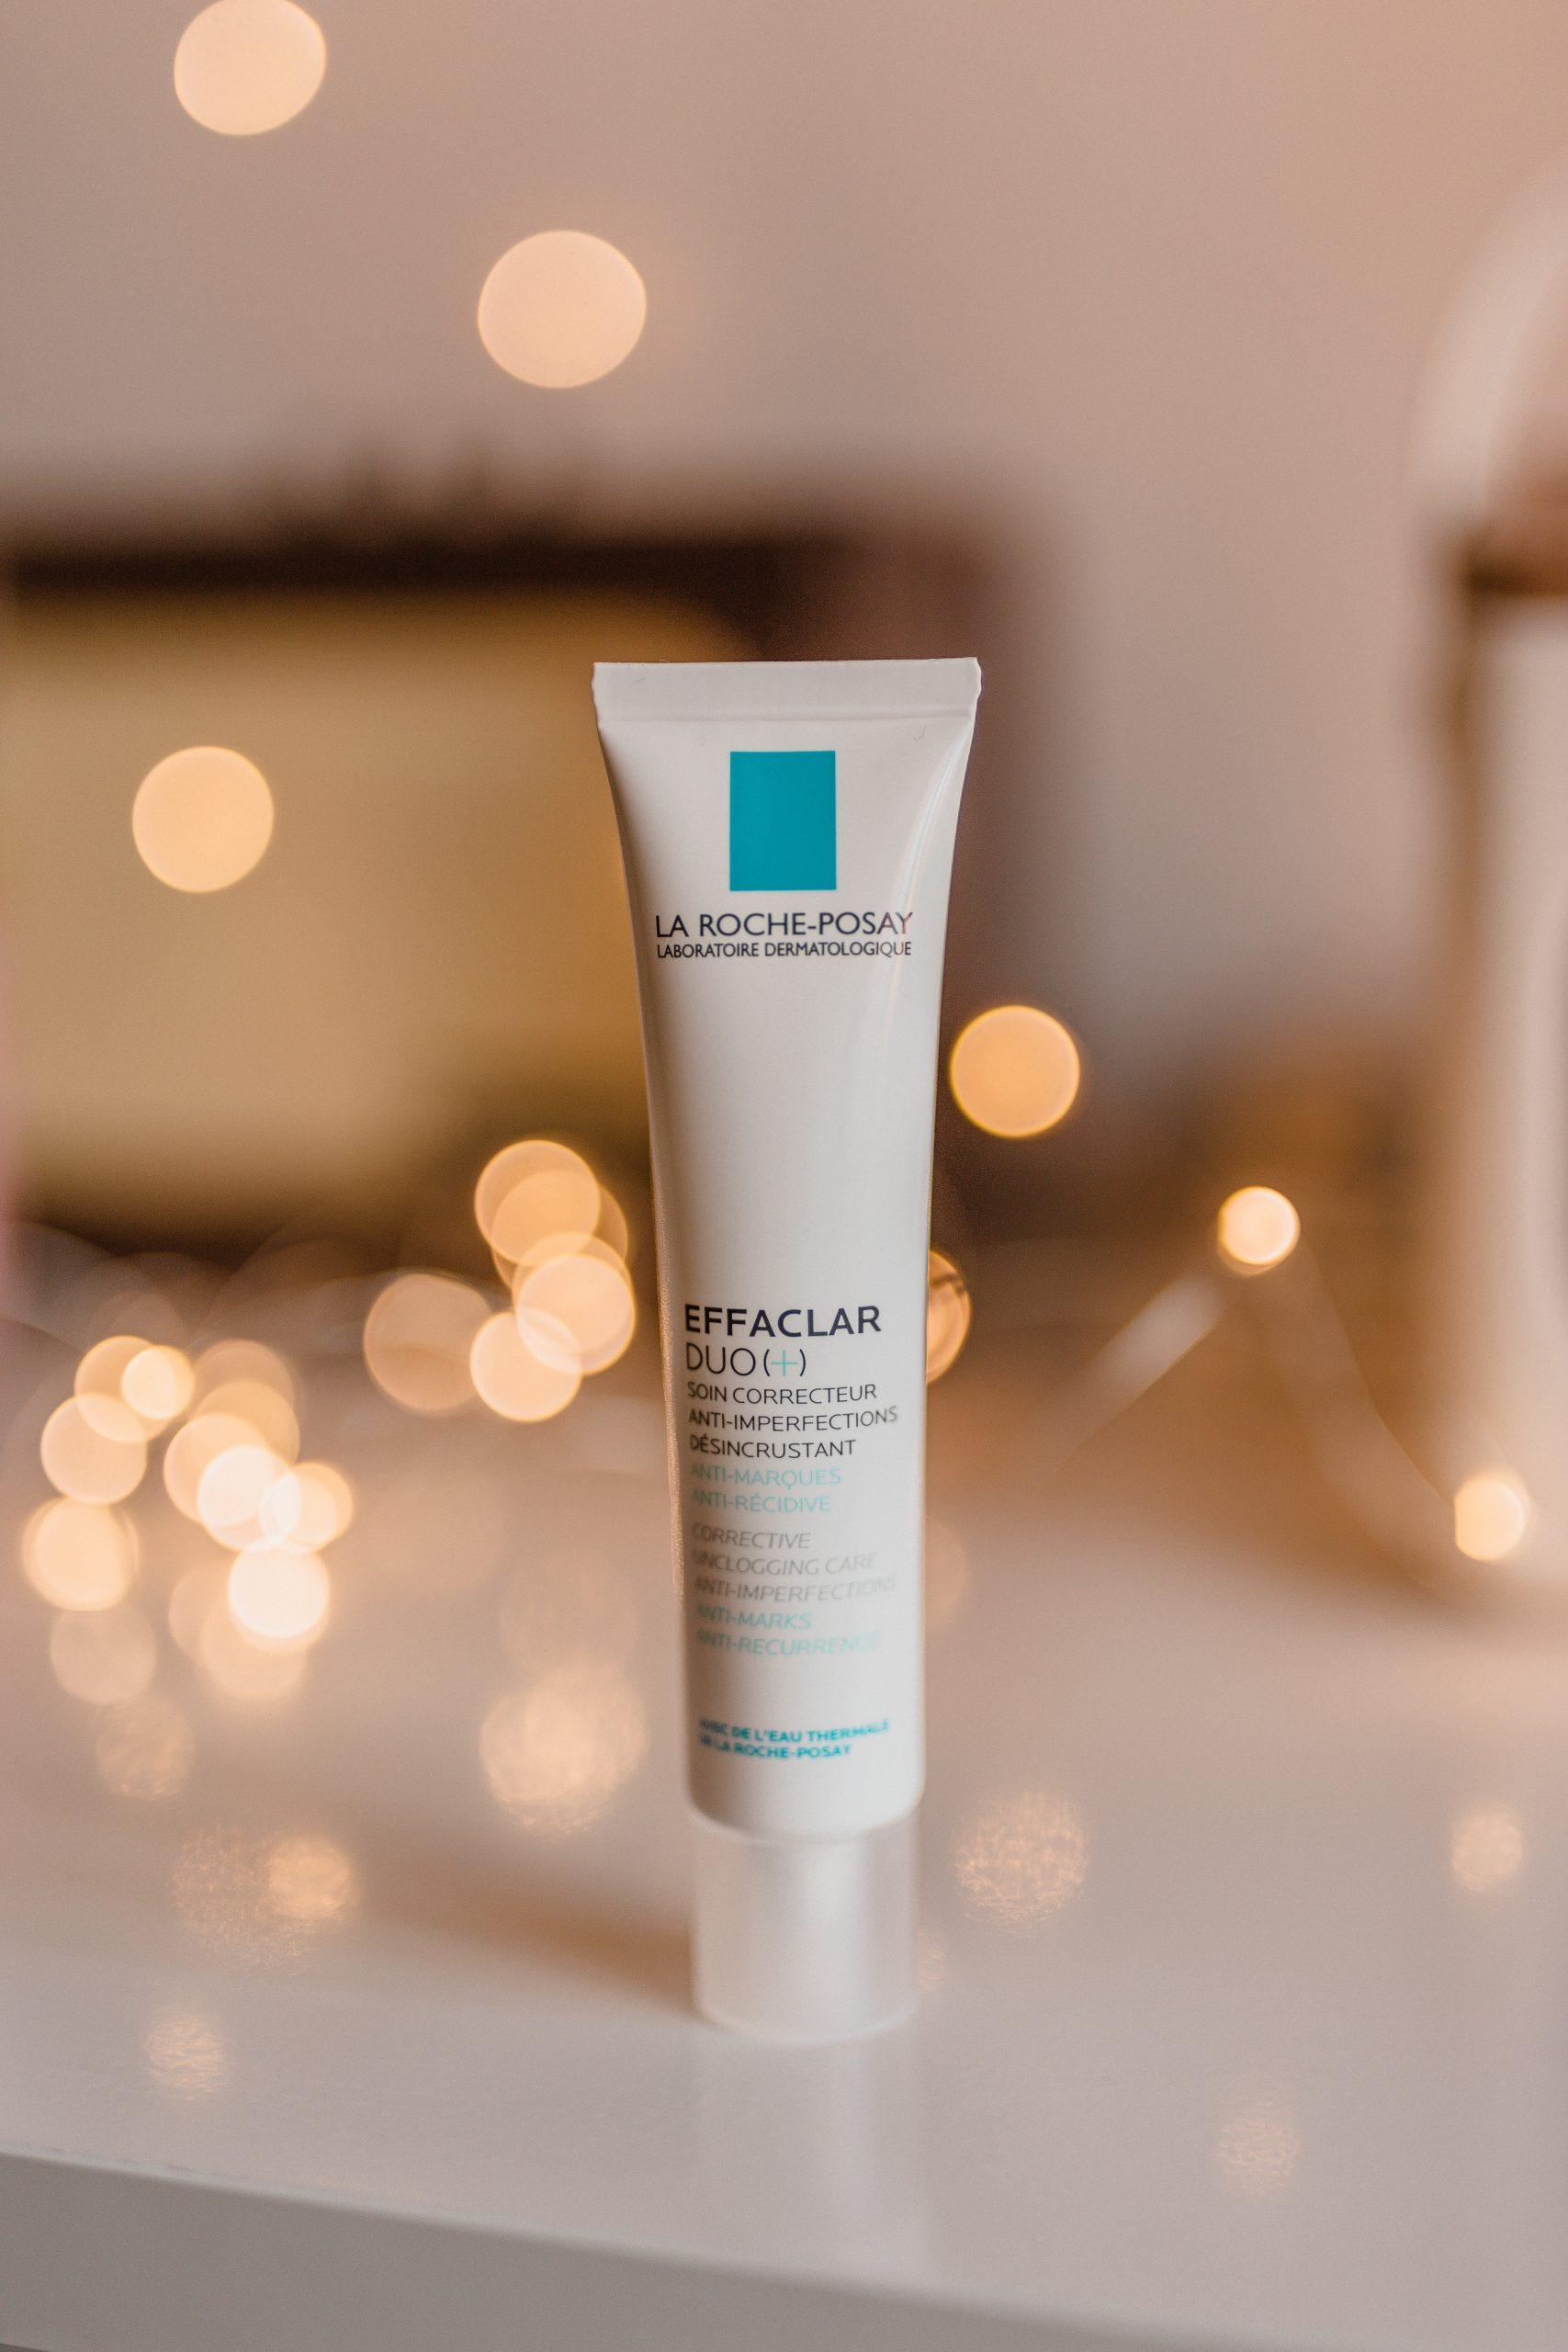 La Roche Posay Effaclar Duo Review, Beauty, Skincare, Blogs, Acne moisturiser, what moisturiser should I buy for spotty skin, acne skincare, UK beauty blogs,